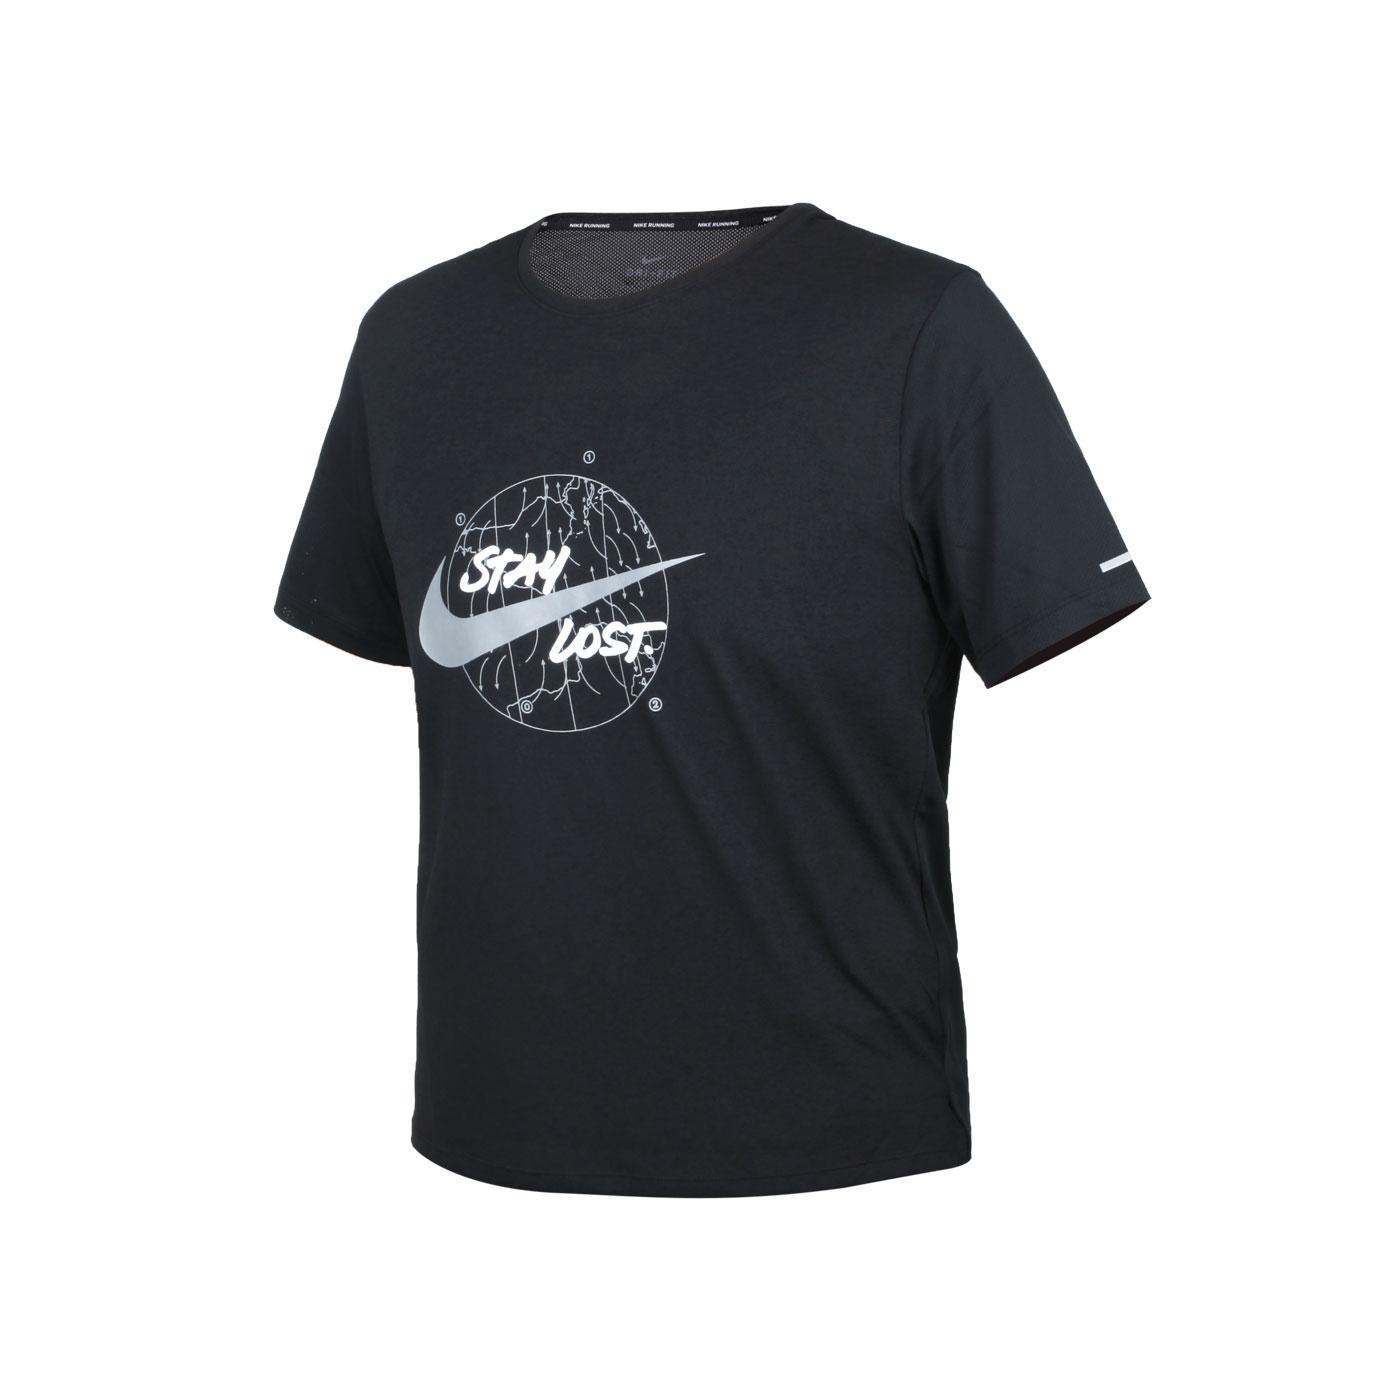 NIKE 男款短袖T恤 DA0217-010 - 黑白